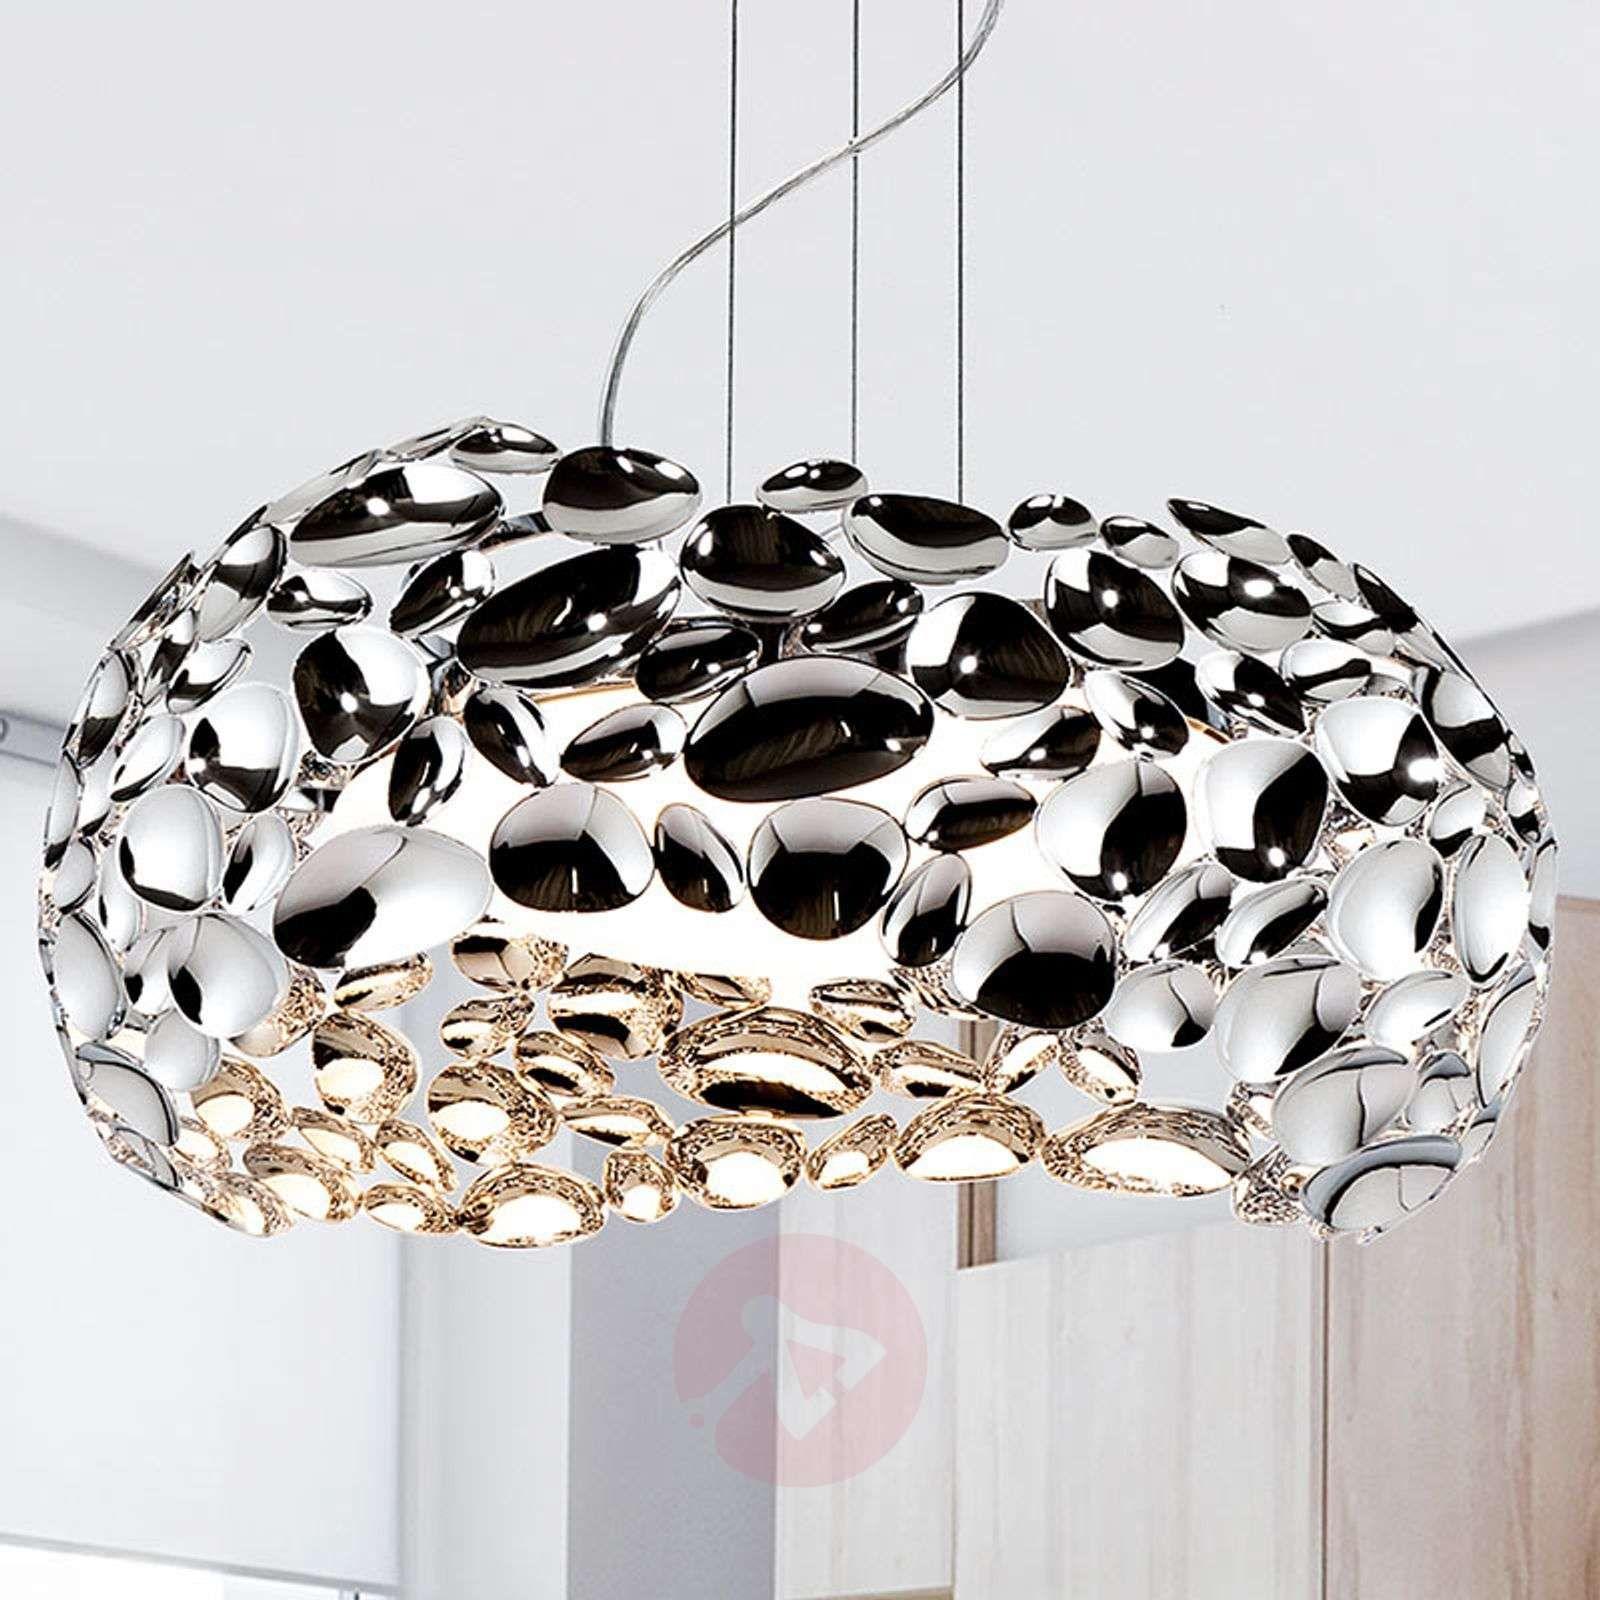 Wspaniała lampa wisząca LED Narisa | Lampy, Led, Lampa wisząca